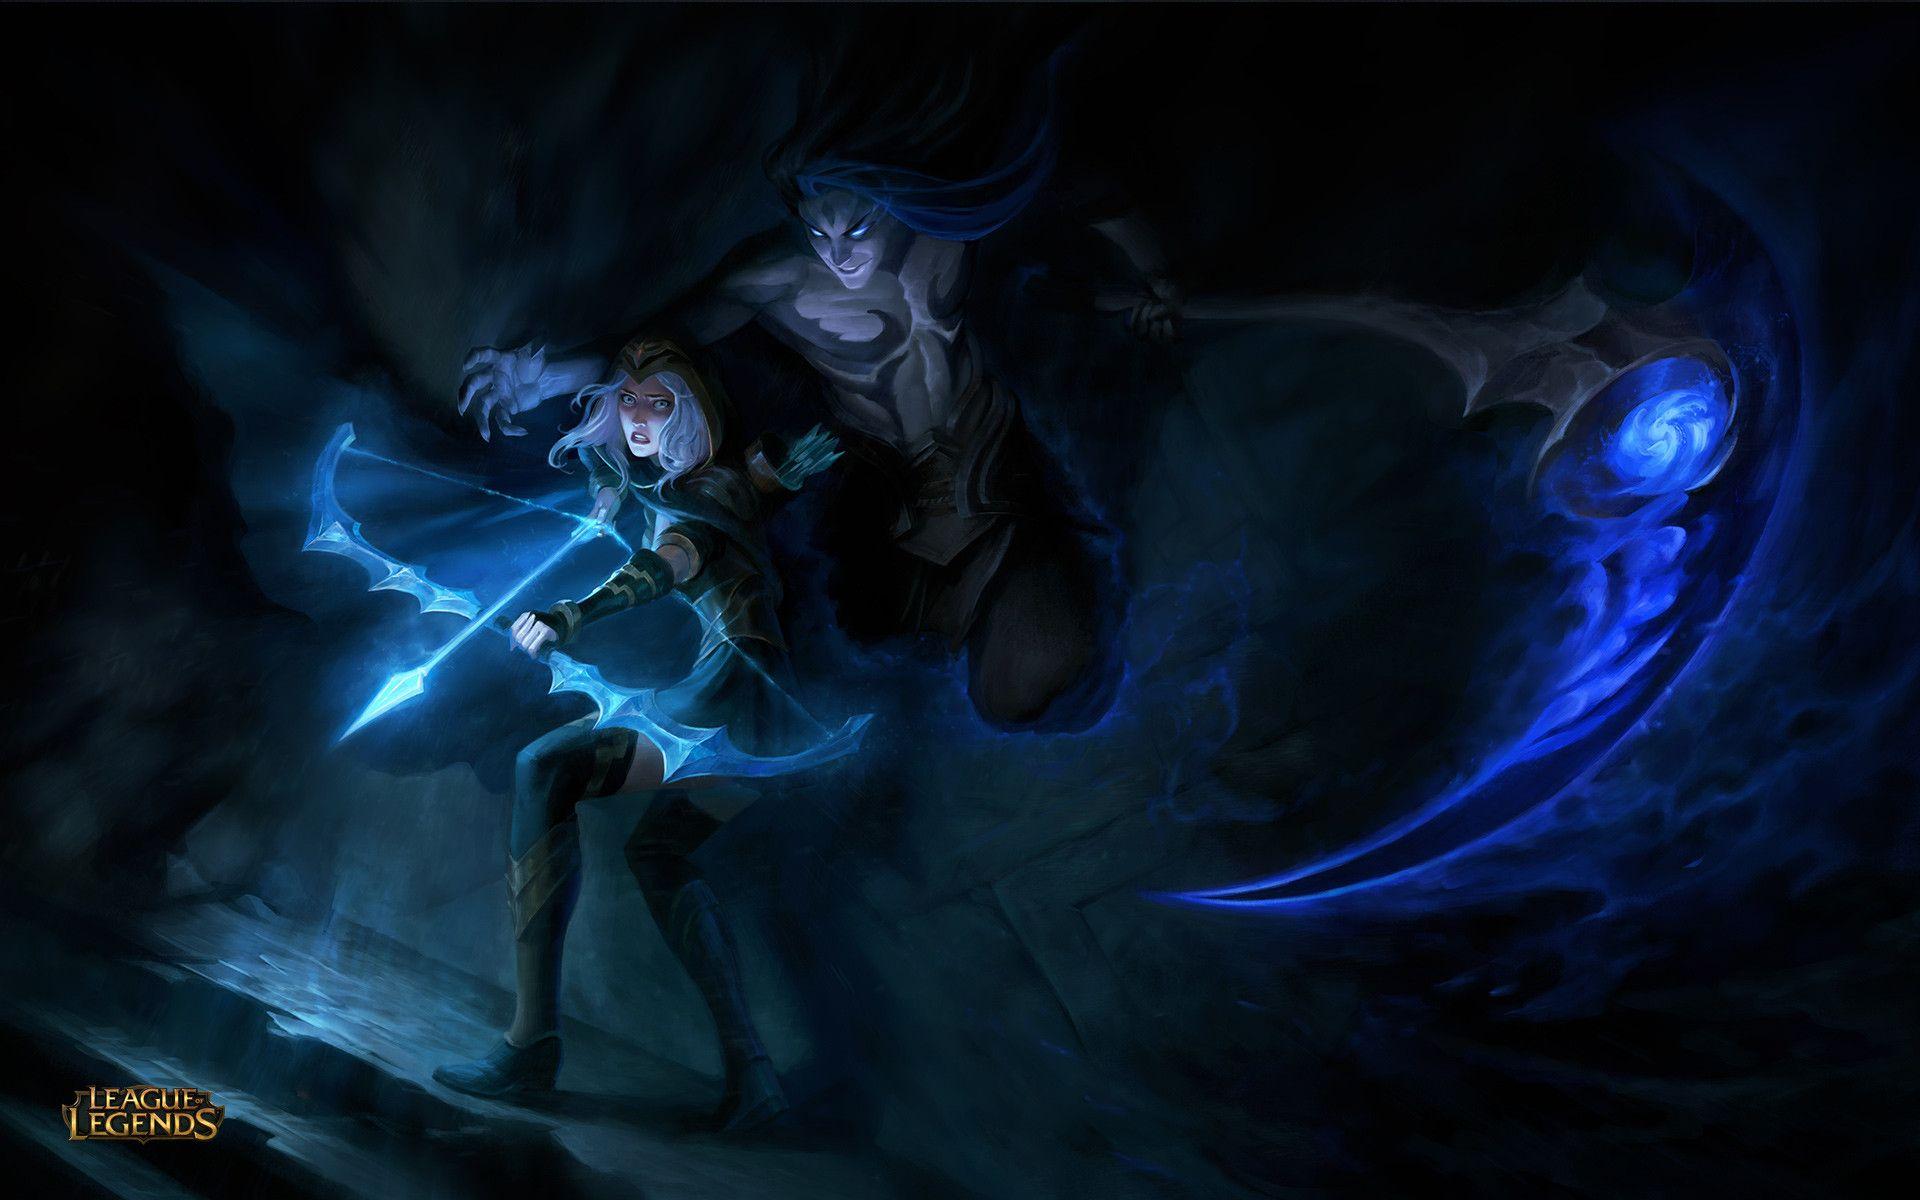 League of Legends Kayn wallpaper. Shadow Assassin, Elena